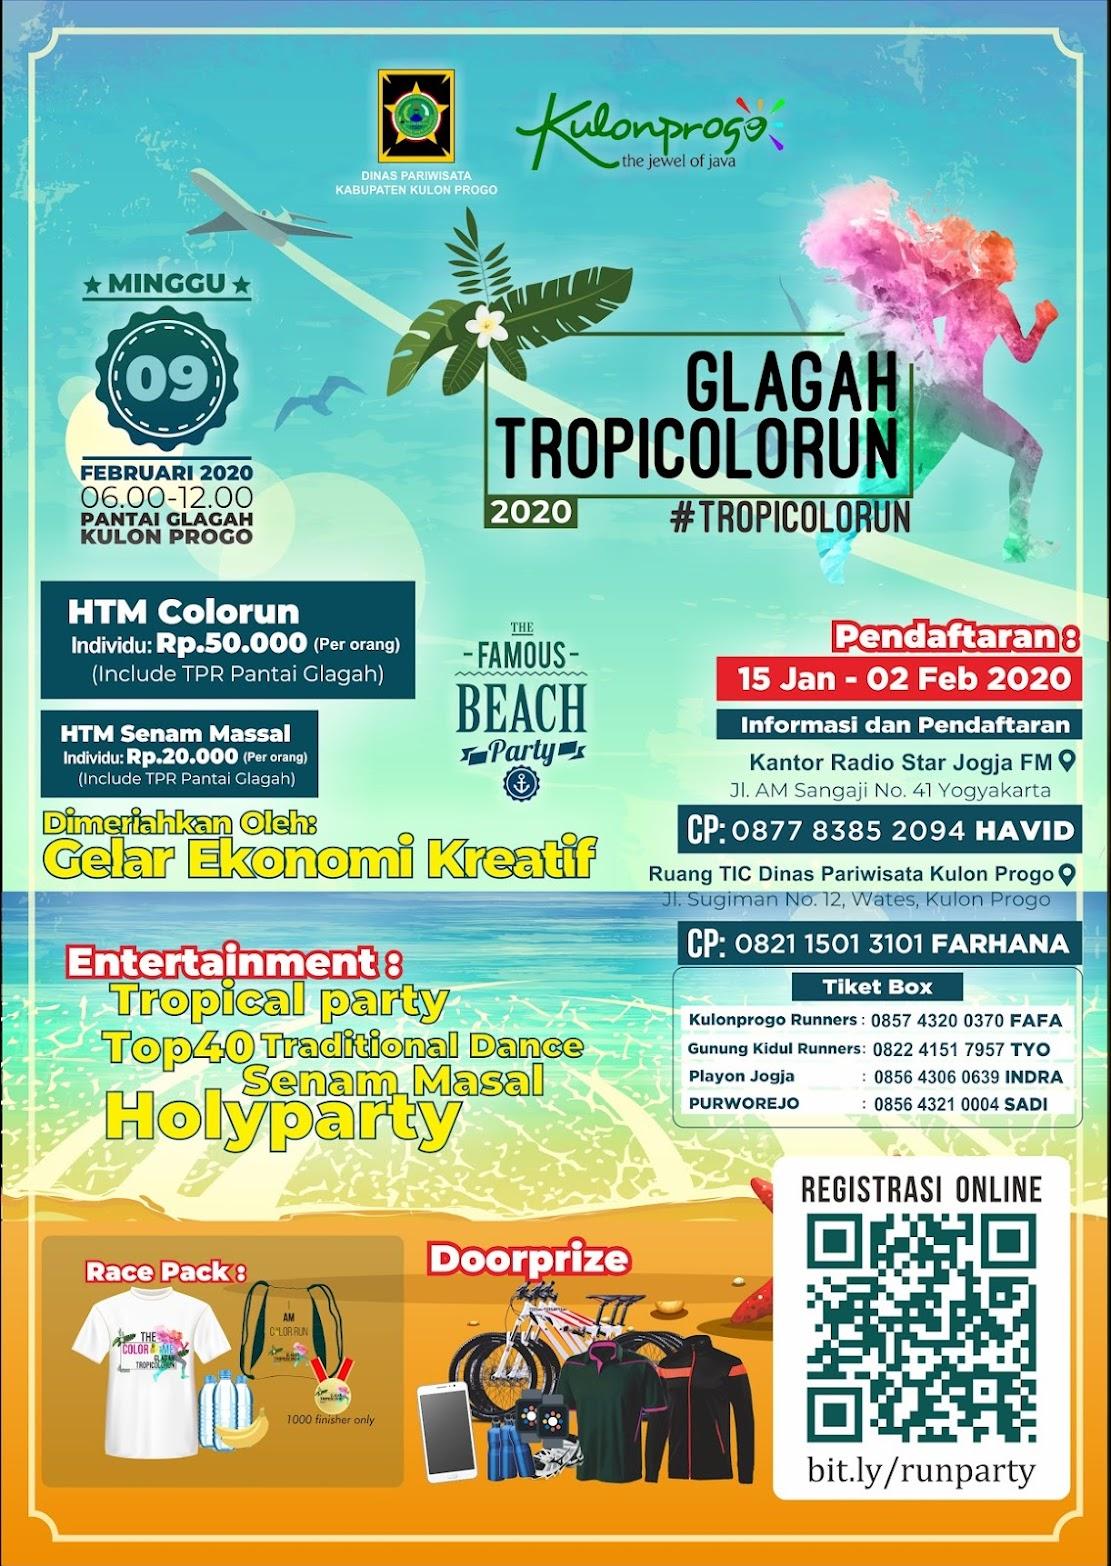 Glagah Tropicolorun • 2020